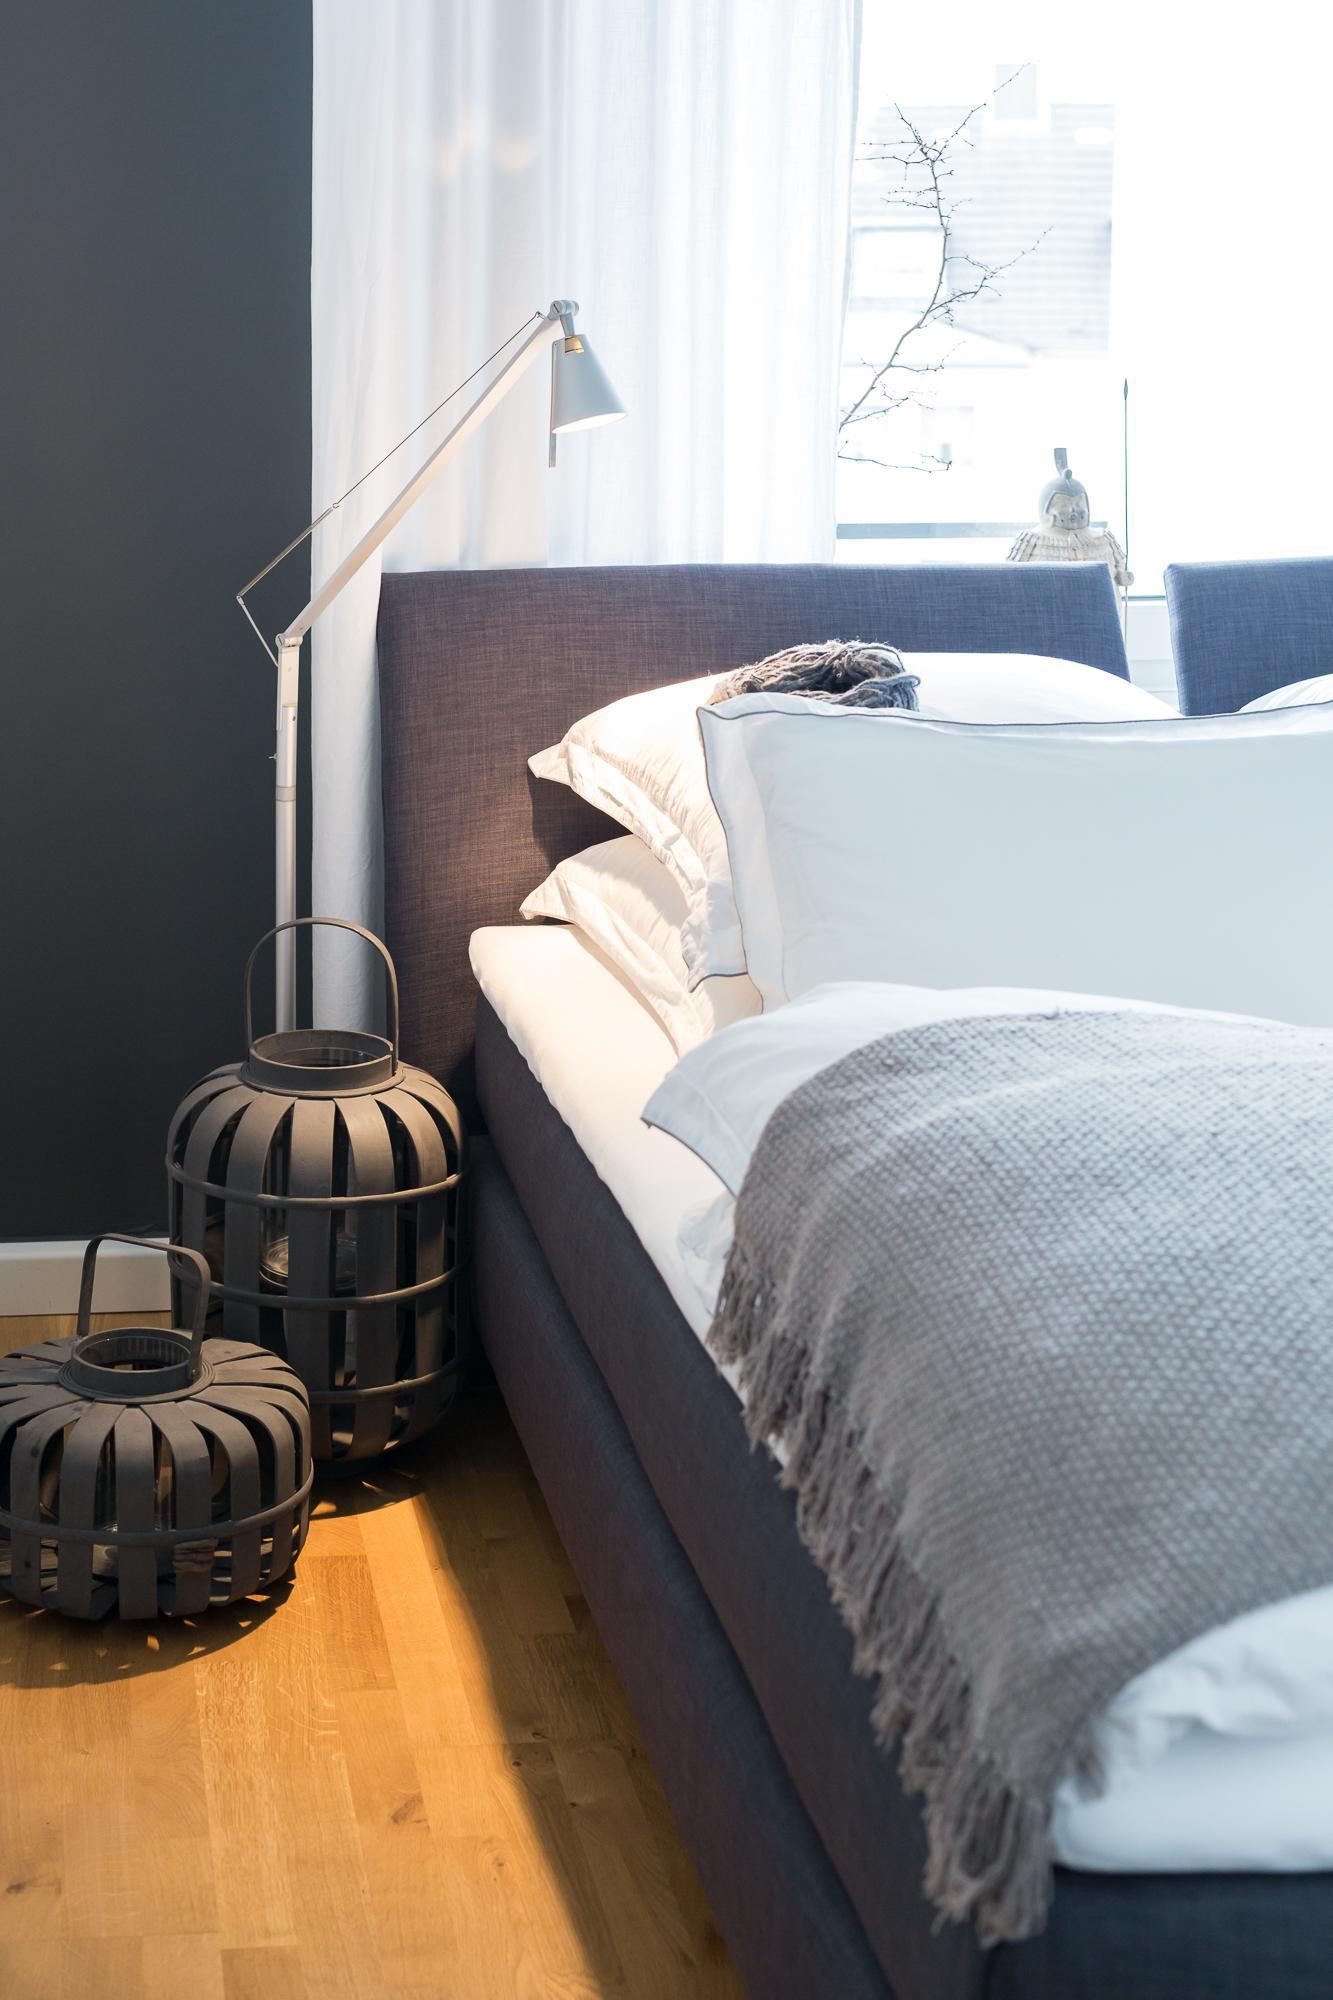 #homestory #schlafzimmer #cozy #boxspringbett #dekoidee